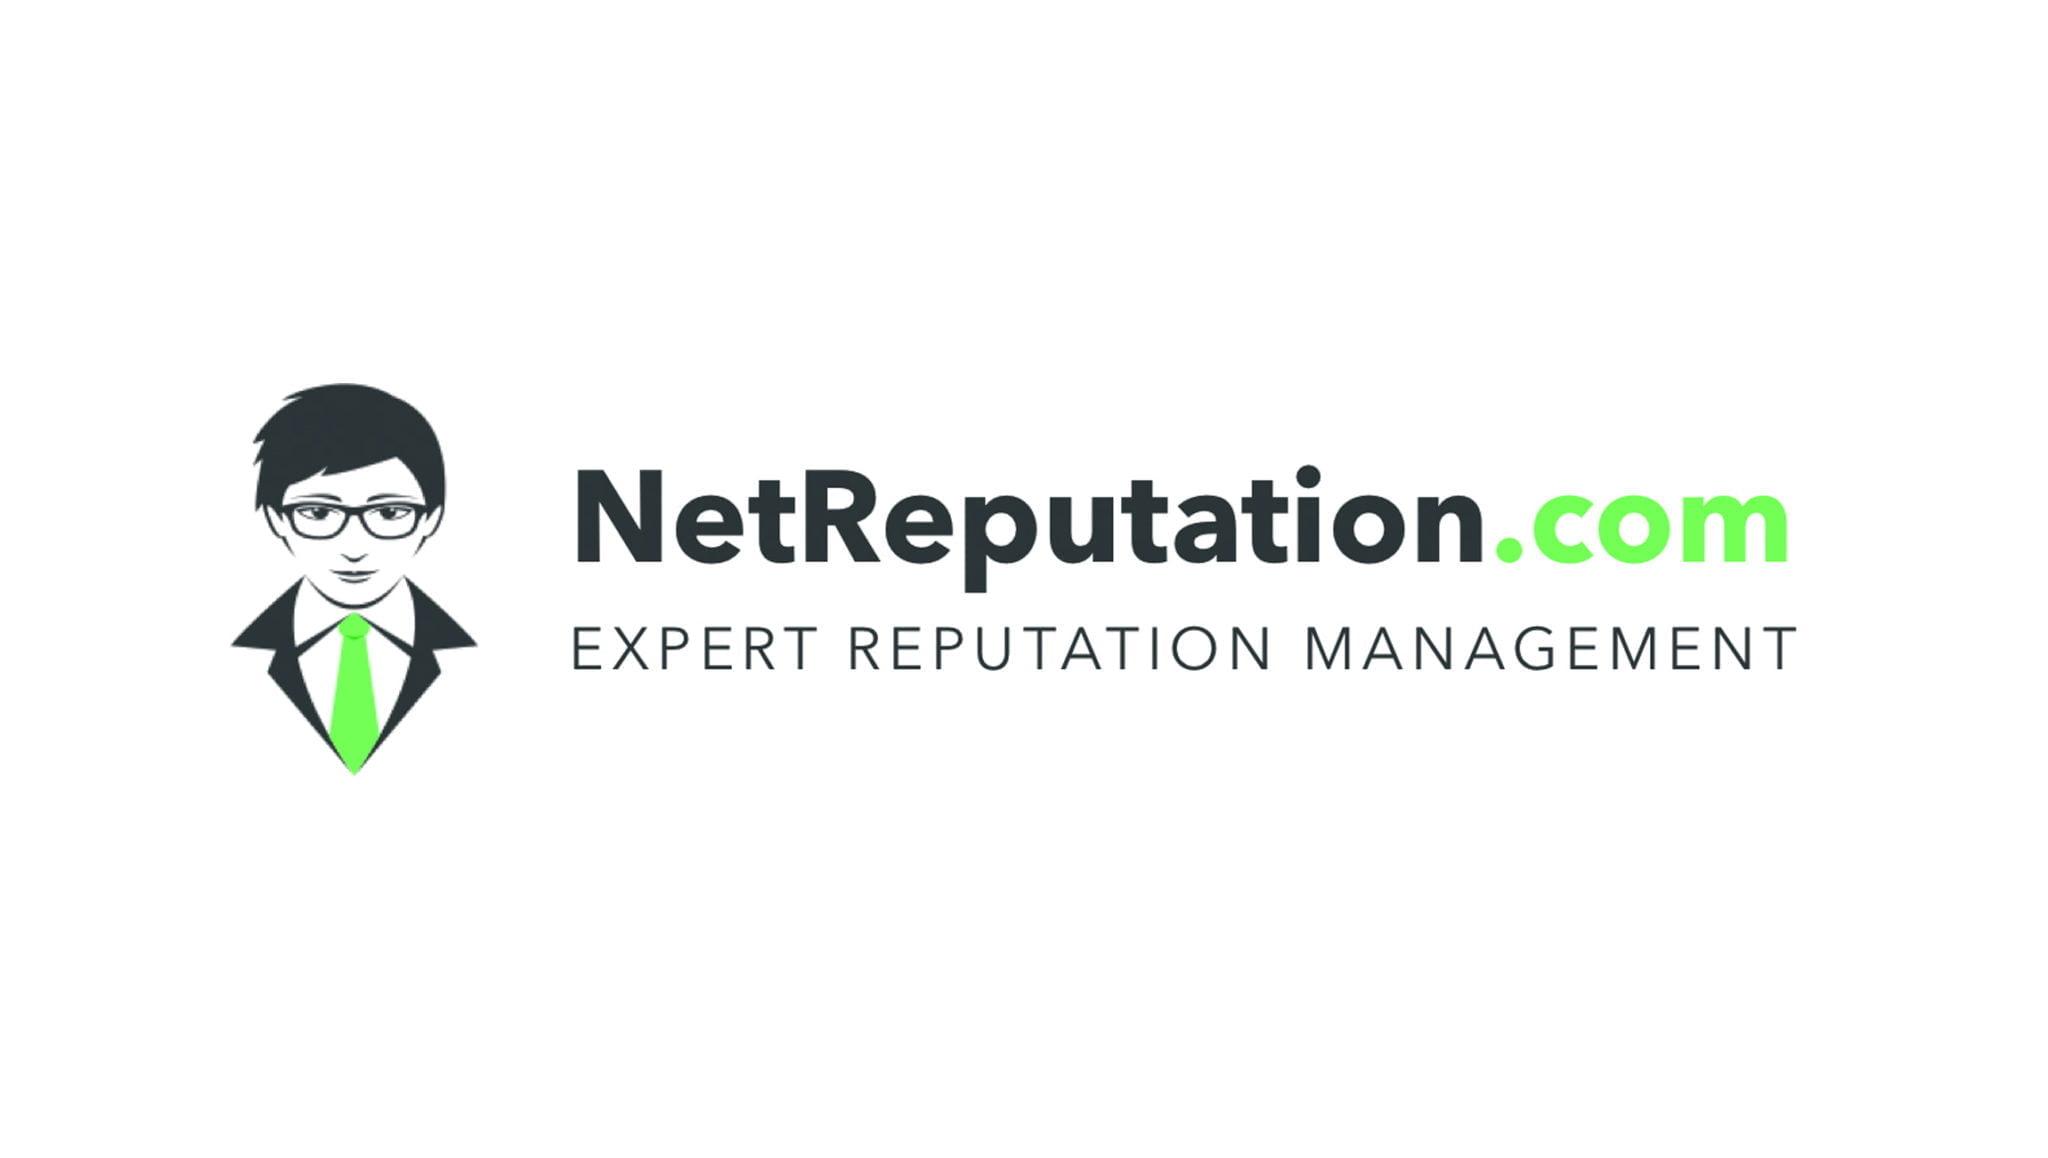 NetReputation.com Celebrates 3rd Anniversary.